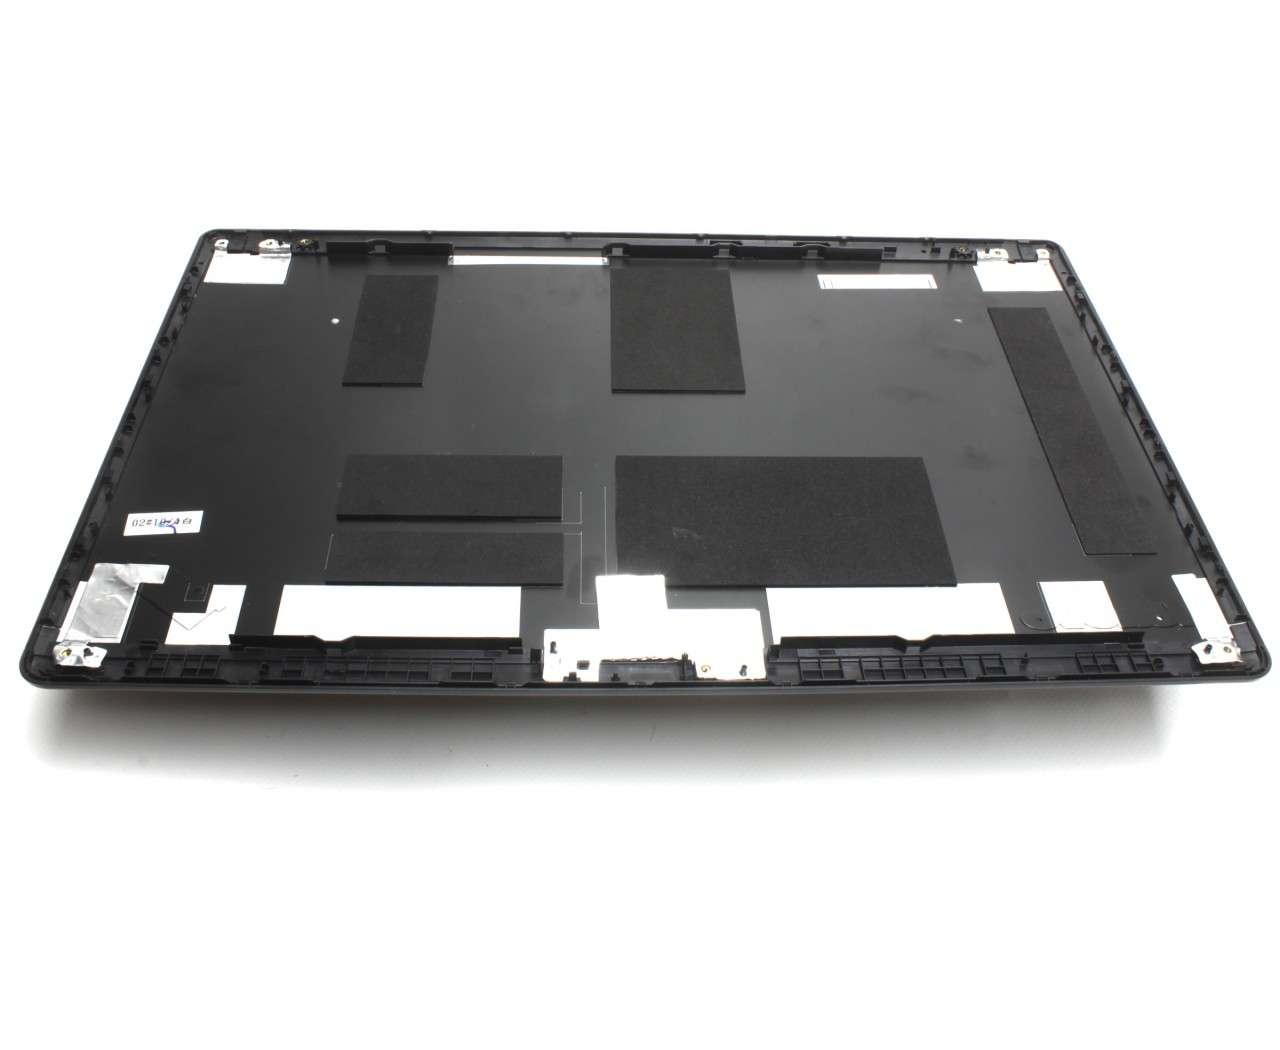 Capac Display BackCover Lenovo ThinkPad Edge E530C Carcasa Display Neagra imagine powerlaptop.ro 2021